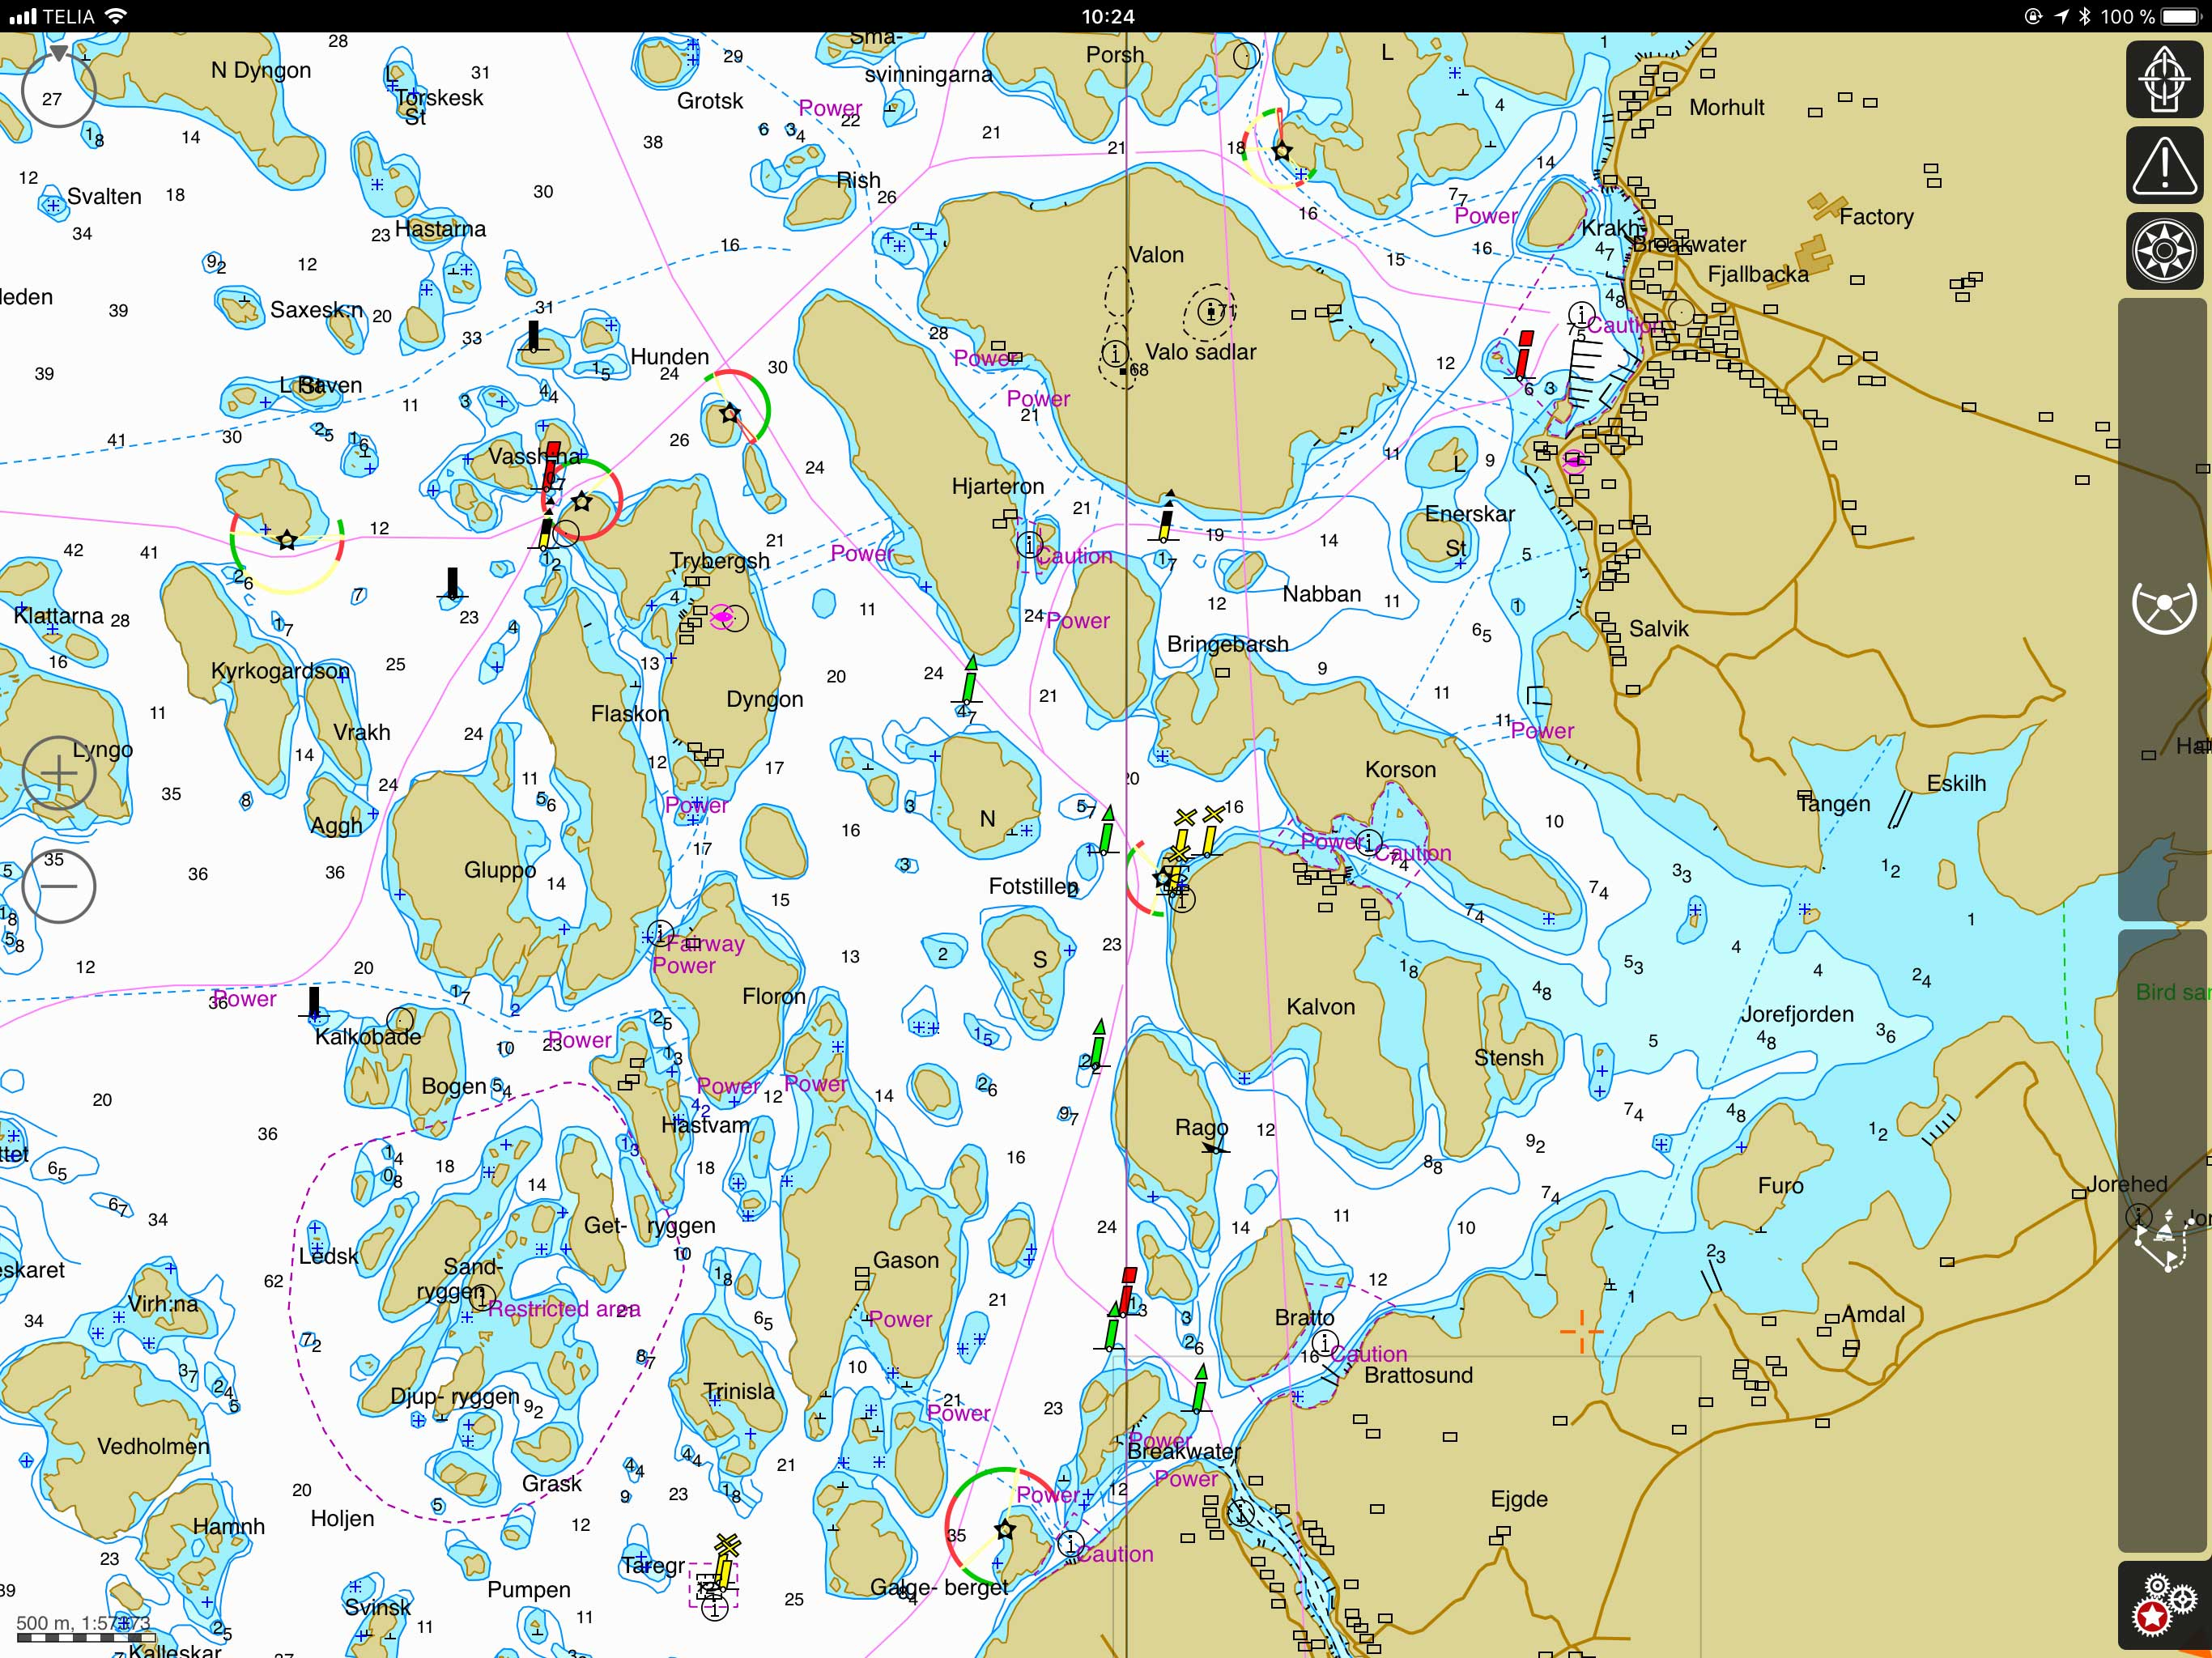 archipelago_transas.jpg